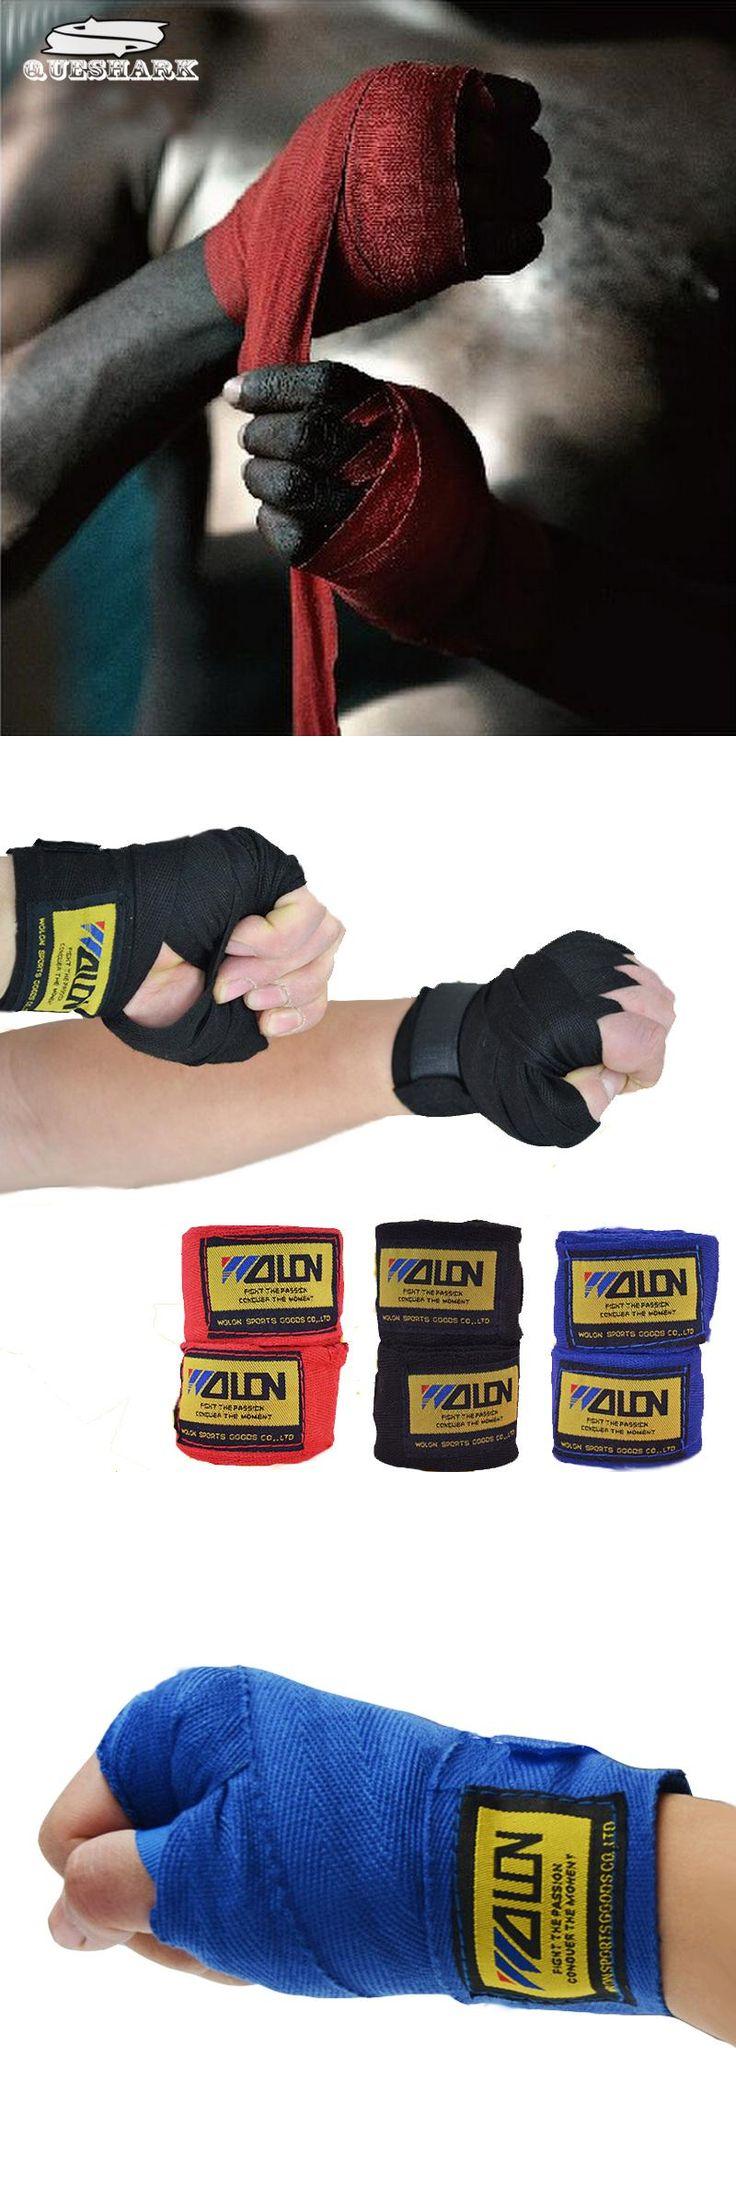 [Visit to Buy] 2pcs/roll Width 5cm Length 2.5M Cotton Boxing Sports Wrist Wraps Strap Bandage Sanda Muay Thai MMA Taekwondo Hand Band Gloves  #Advertisement